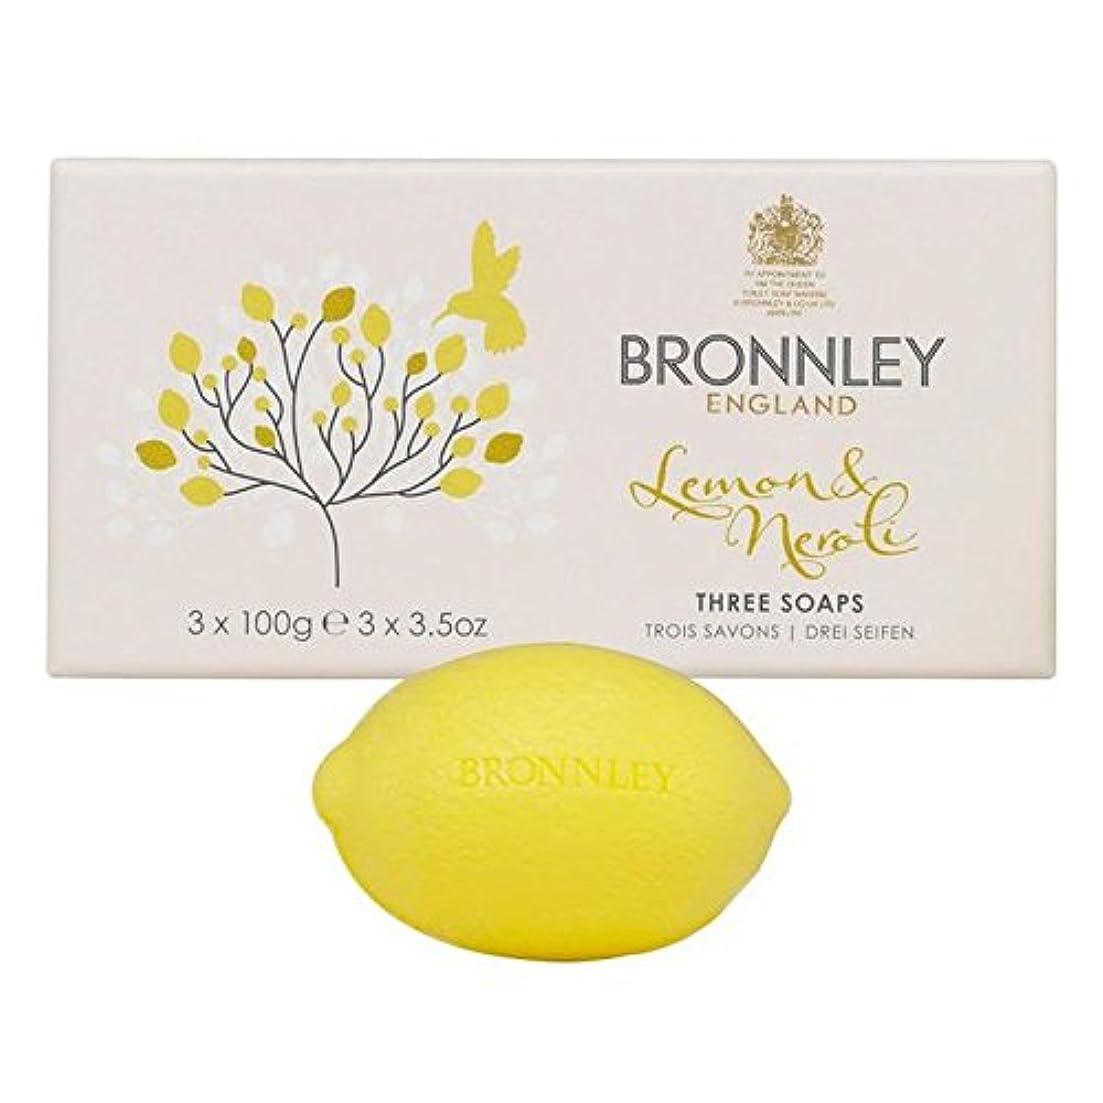 Bronnley Lemon & Neroli Soaps 3 x 100g - レモン&ネロリ石鹸3×100グラム [並行輸入品]